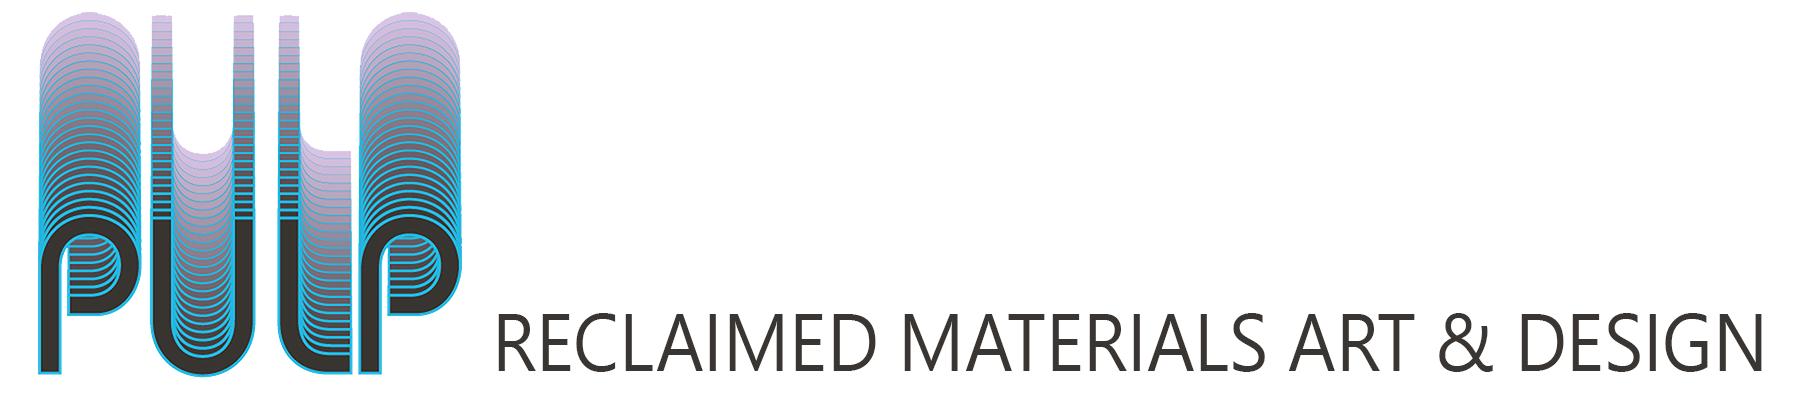 PULP: Reclaimed Materials Art & Design